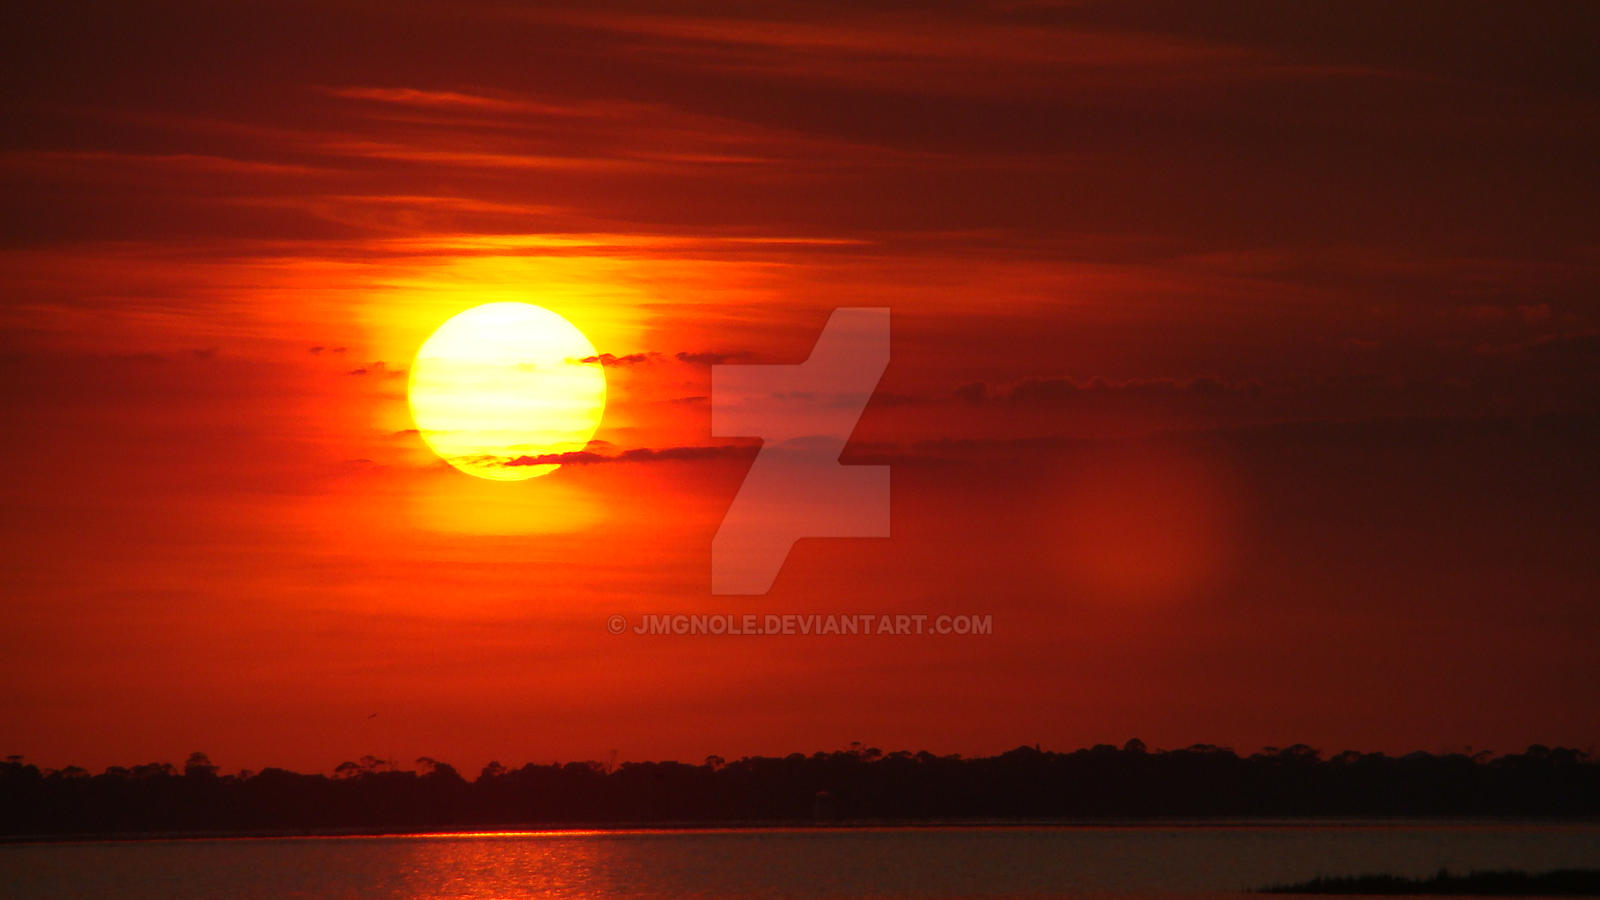 Sunset on St. Joseph's Bay